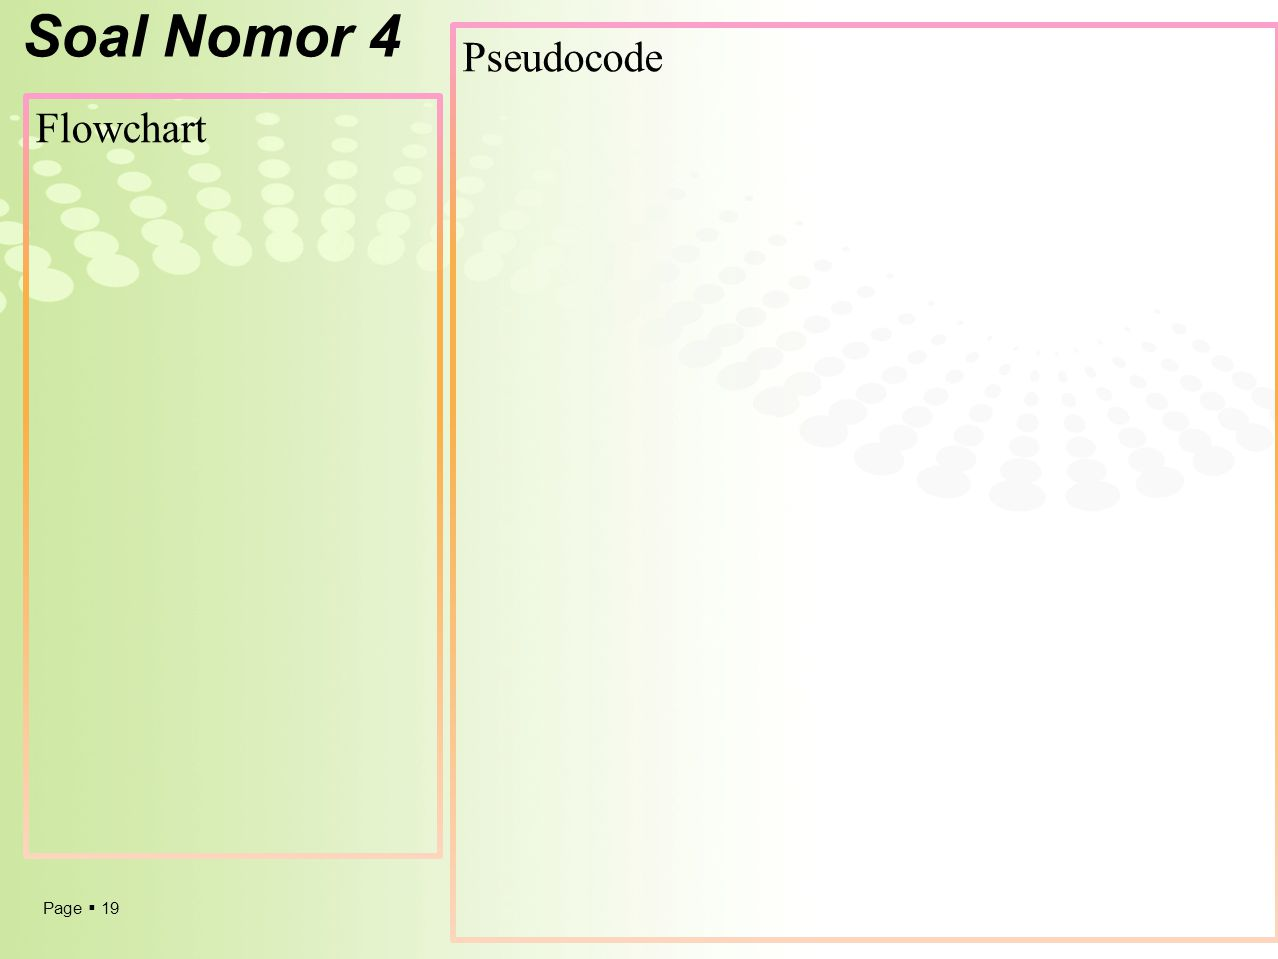 Soal Nomor 4 Pseudocode Flowchart